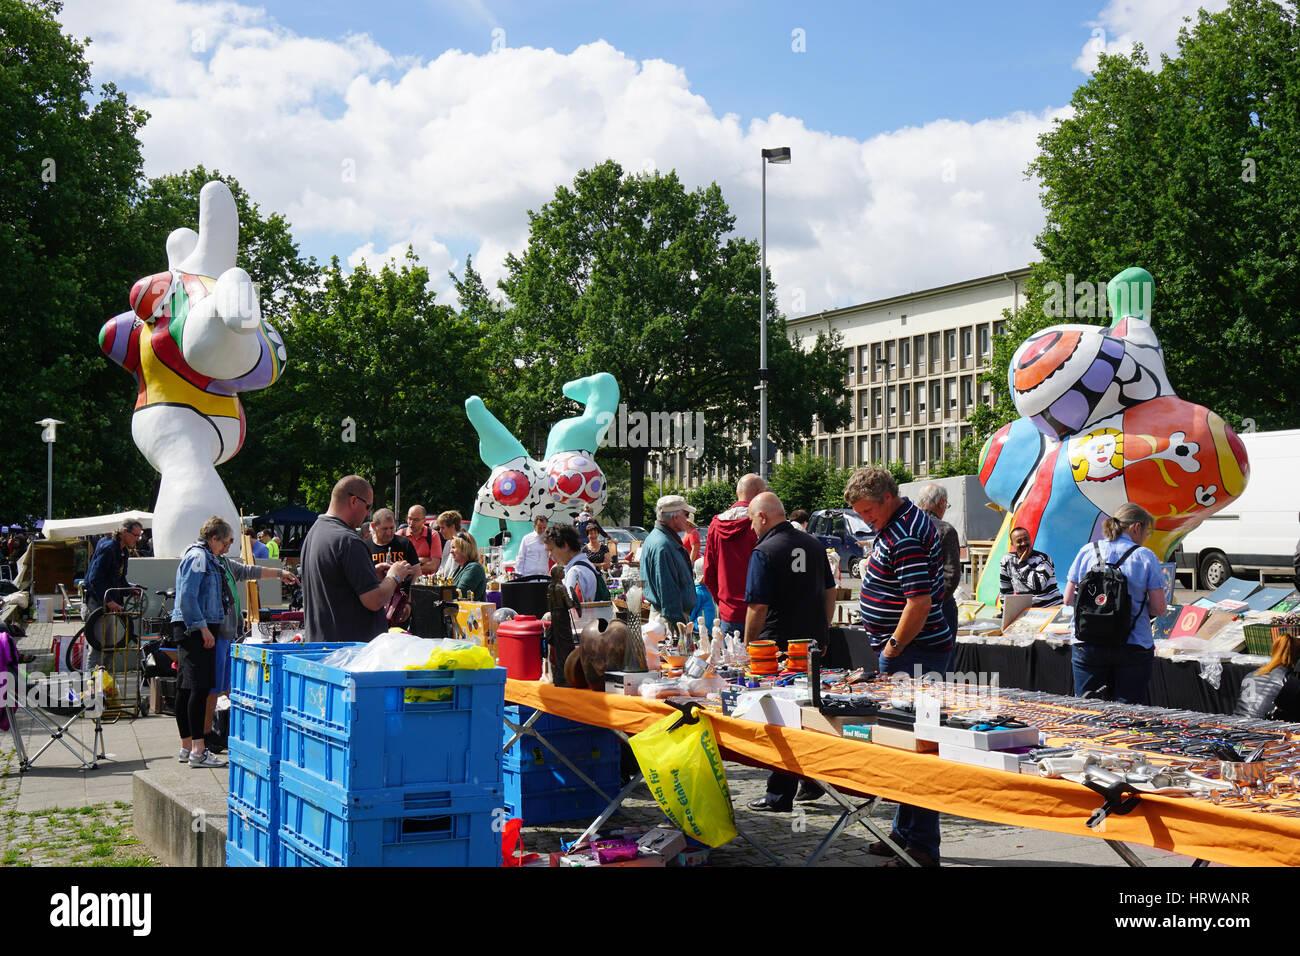 Hannover Messe Flohmarkt : niki de saint phalle sculpture germany stockfotos niki de saint phalle sculpture germany ~ Markanthonyermac.com Haus und Dekorationen